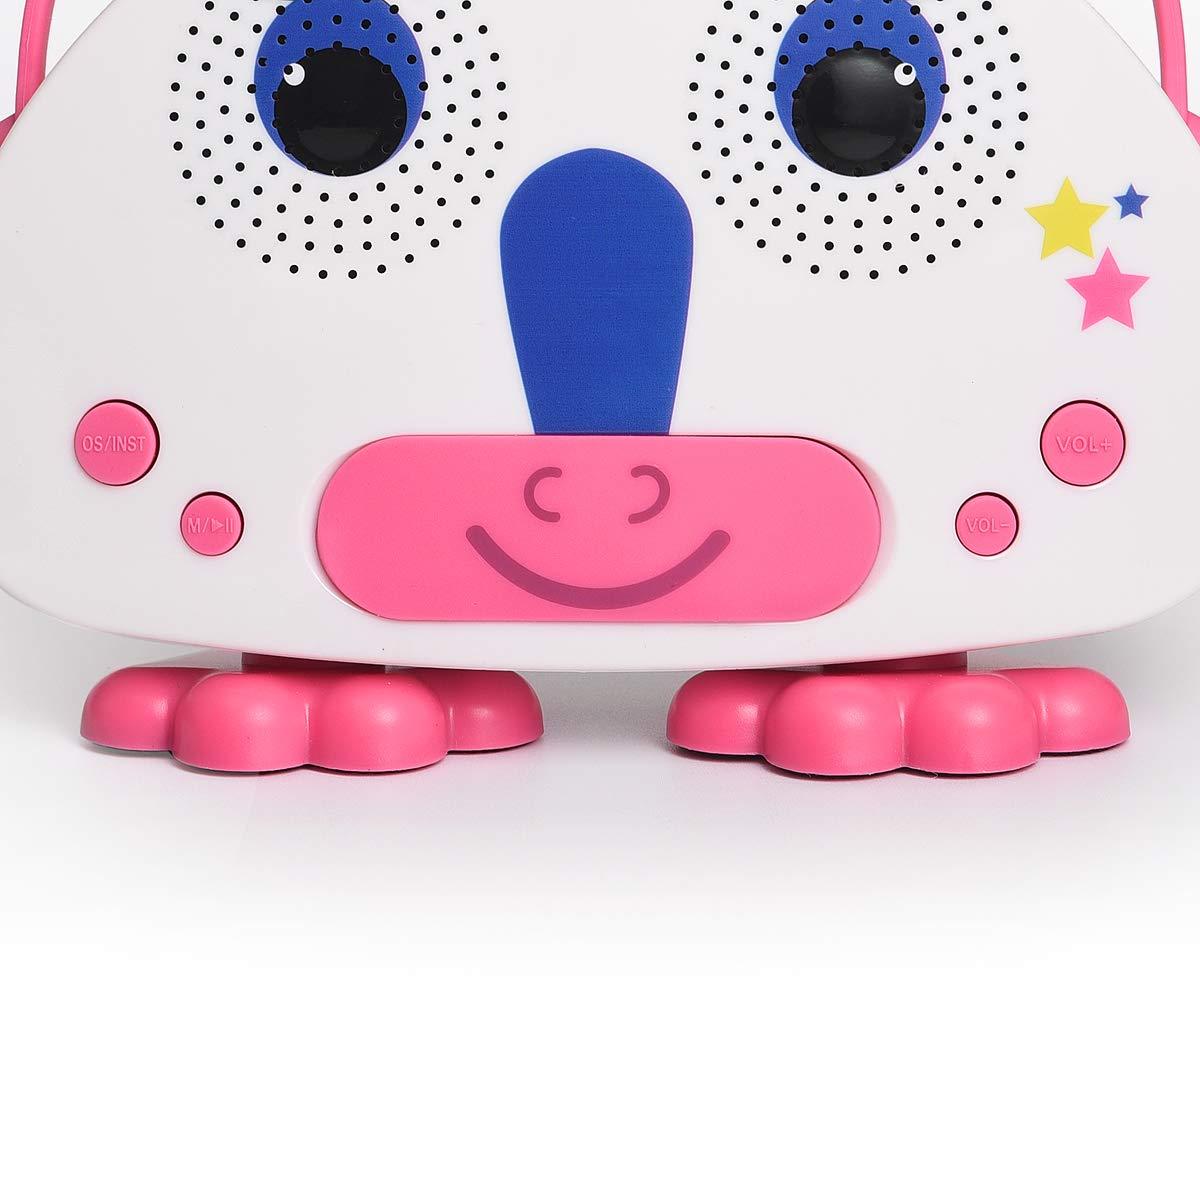 HowQ Outdoor Toys Karaoke Machine , Portable Kids Karaoke Bluetooth Speaker Wireless Cartoon Speaker for Kids for Indoor Toys Travel Activities with Microphone Karaoke Machine(Pink-White) by HowQ (Image #5)